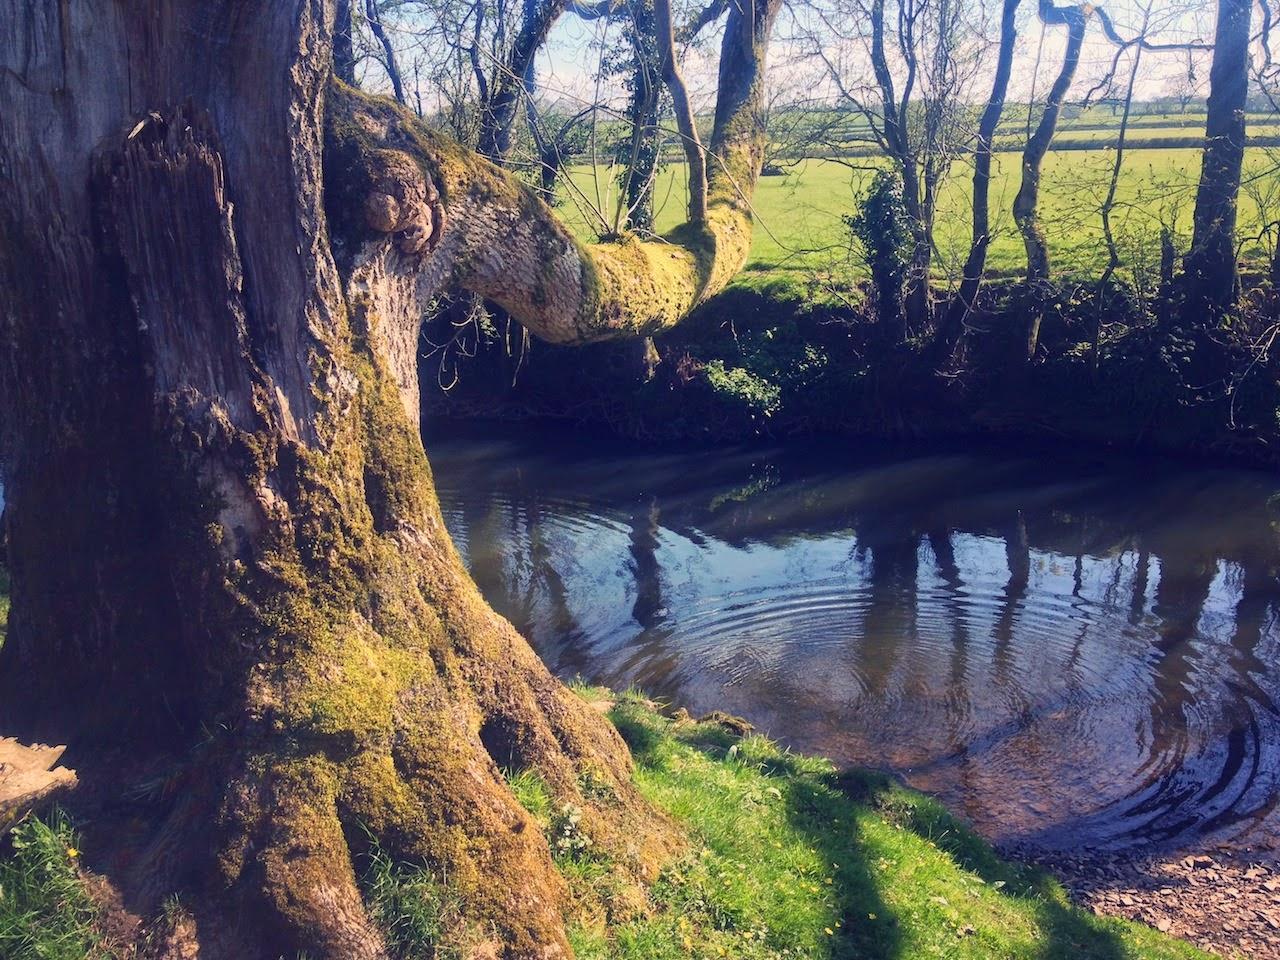 Strawbridge, hatherleigh, river